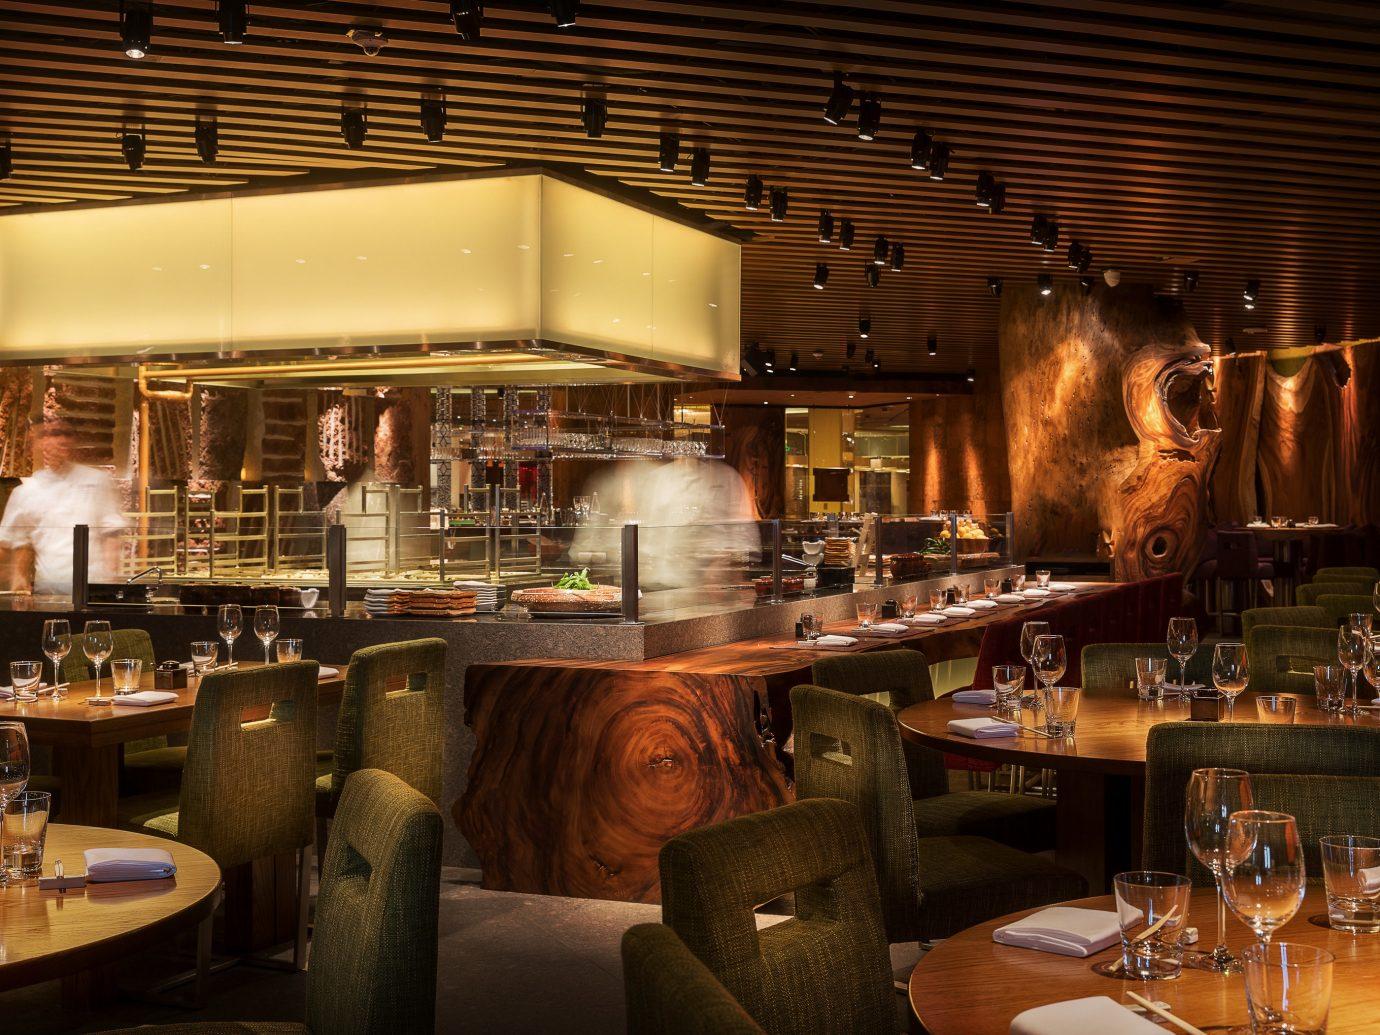 Food + Drink indoor table window restaurant meal Bar interior design café estate cuisine area